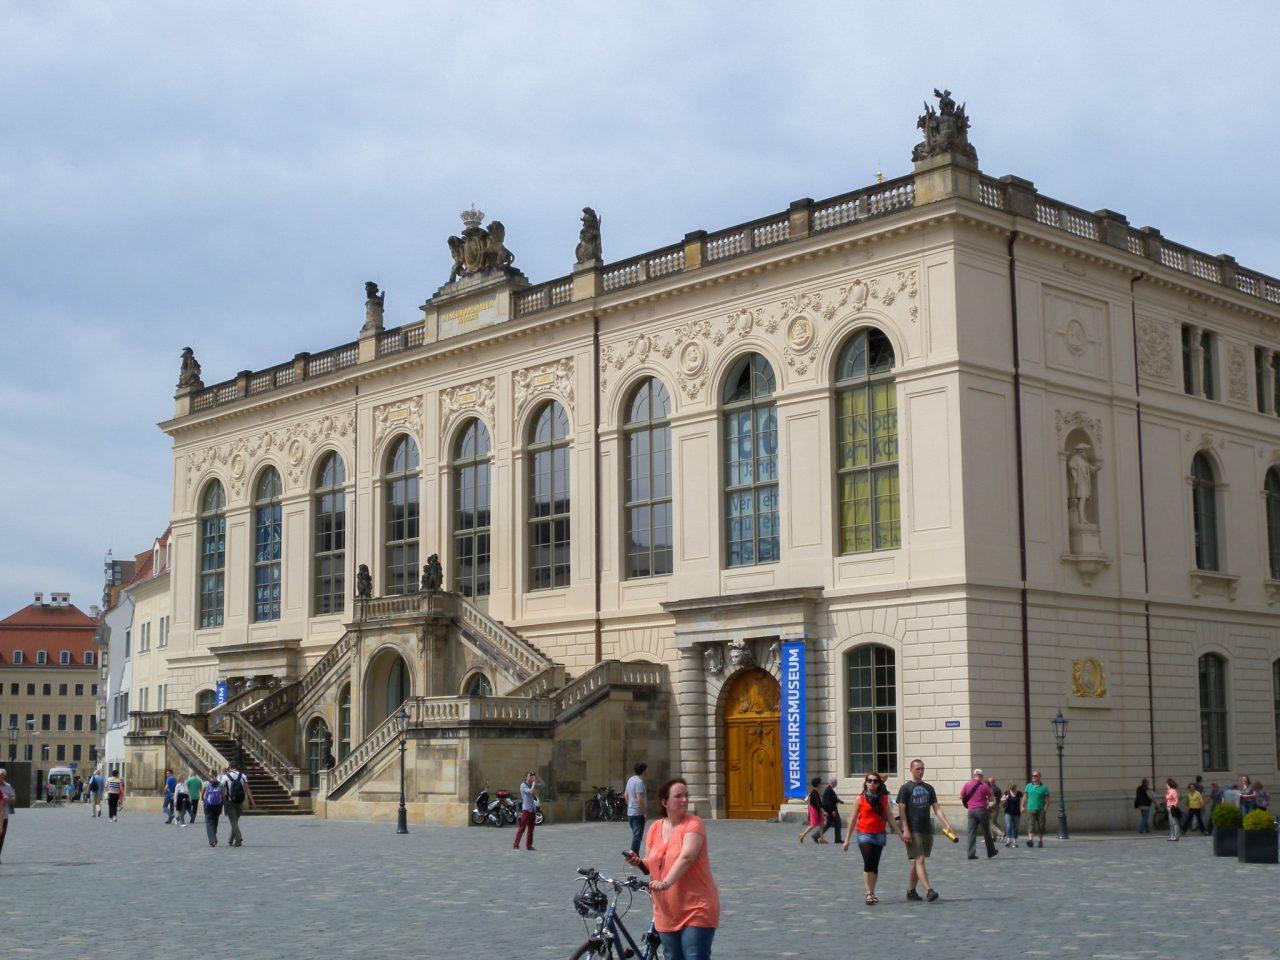 Музей транспорта (Verkehrsmuseum)